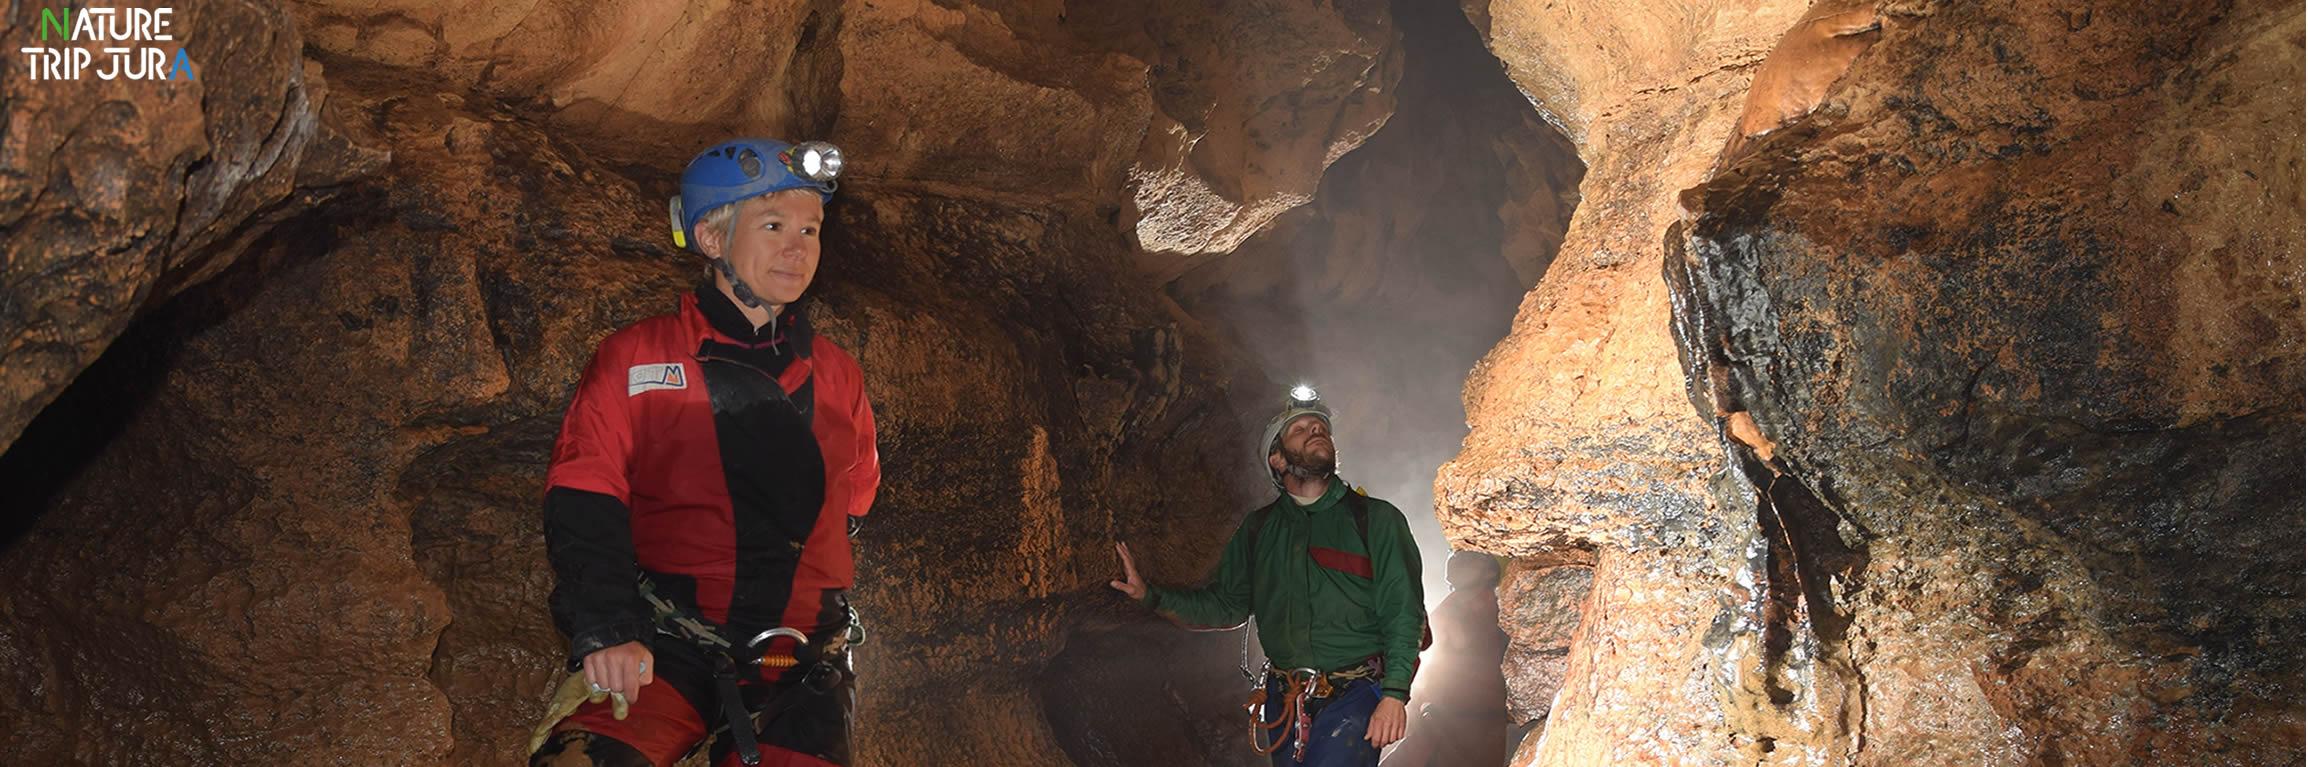 Initiation à la speleo Jura Franche comté avec Nature Trip Jura